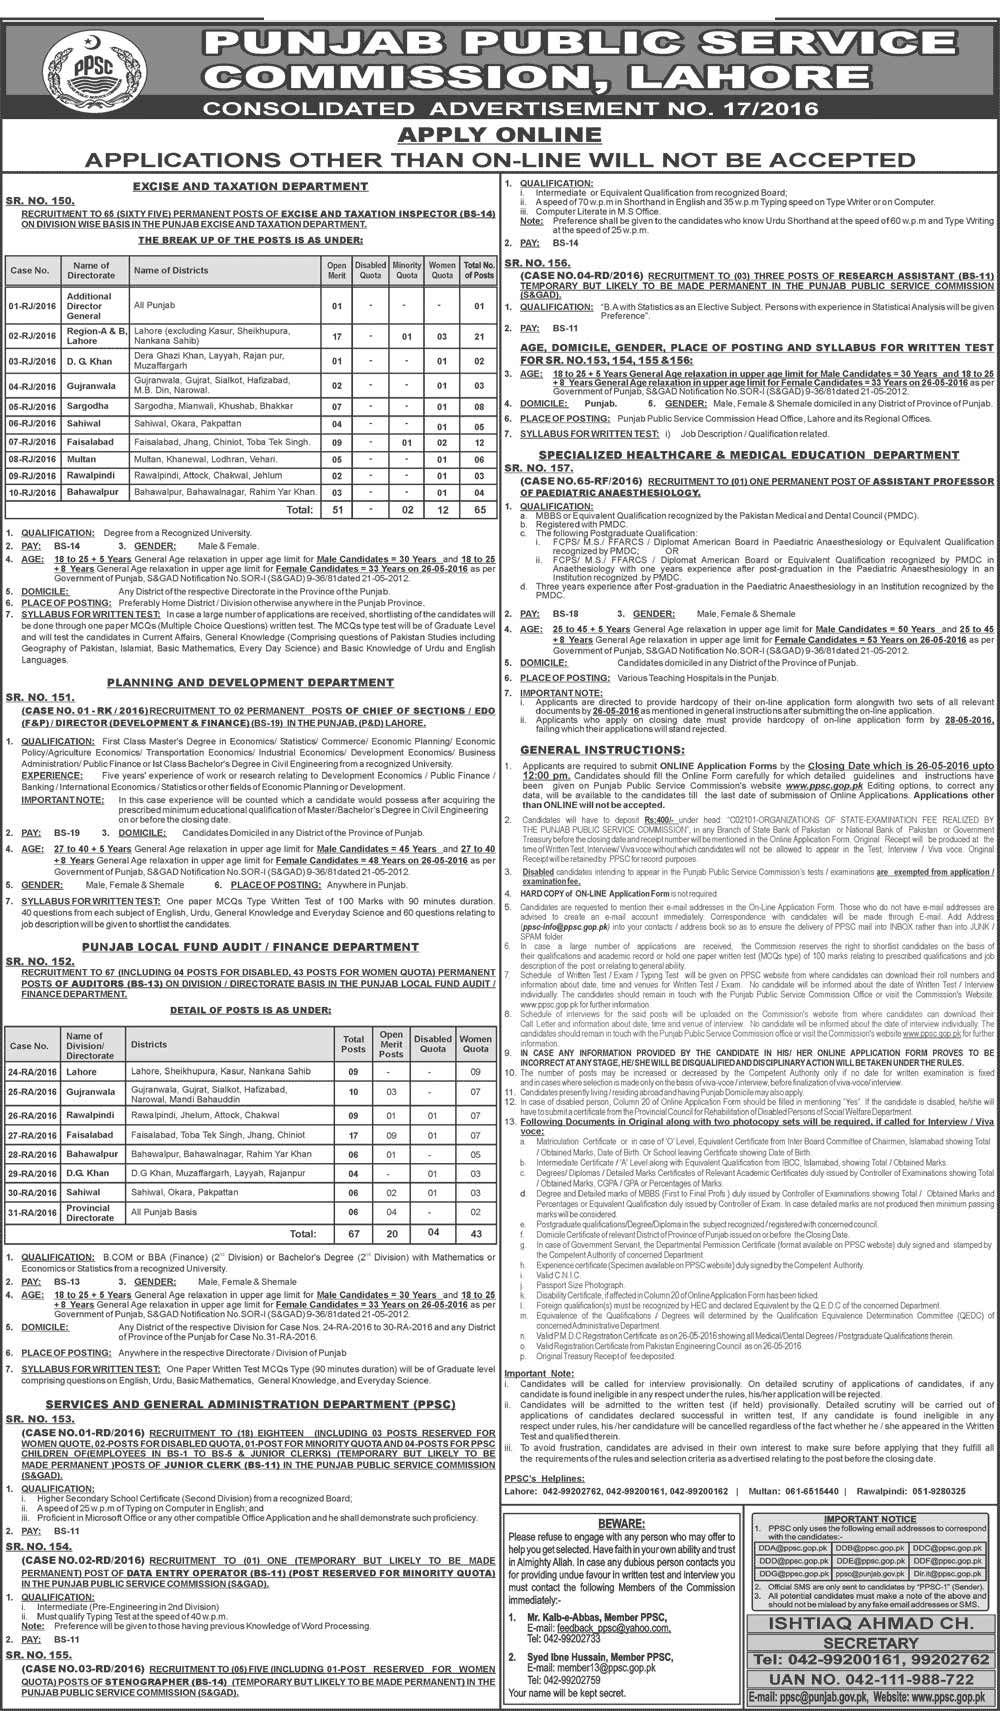 Punjab Public Service Commission Adv 17-2016